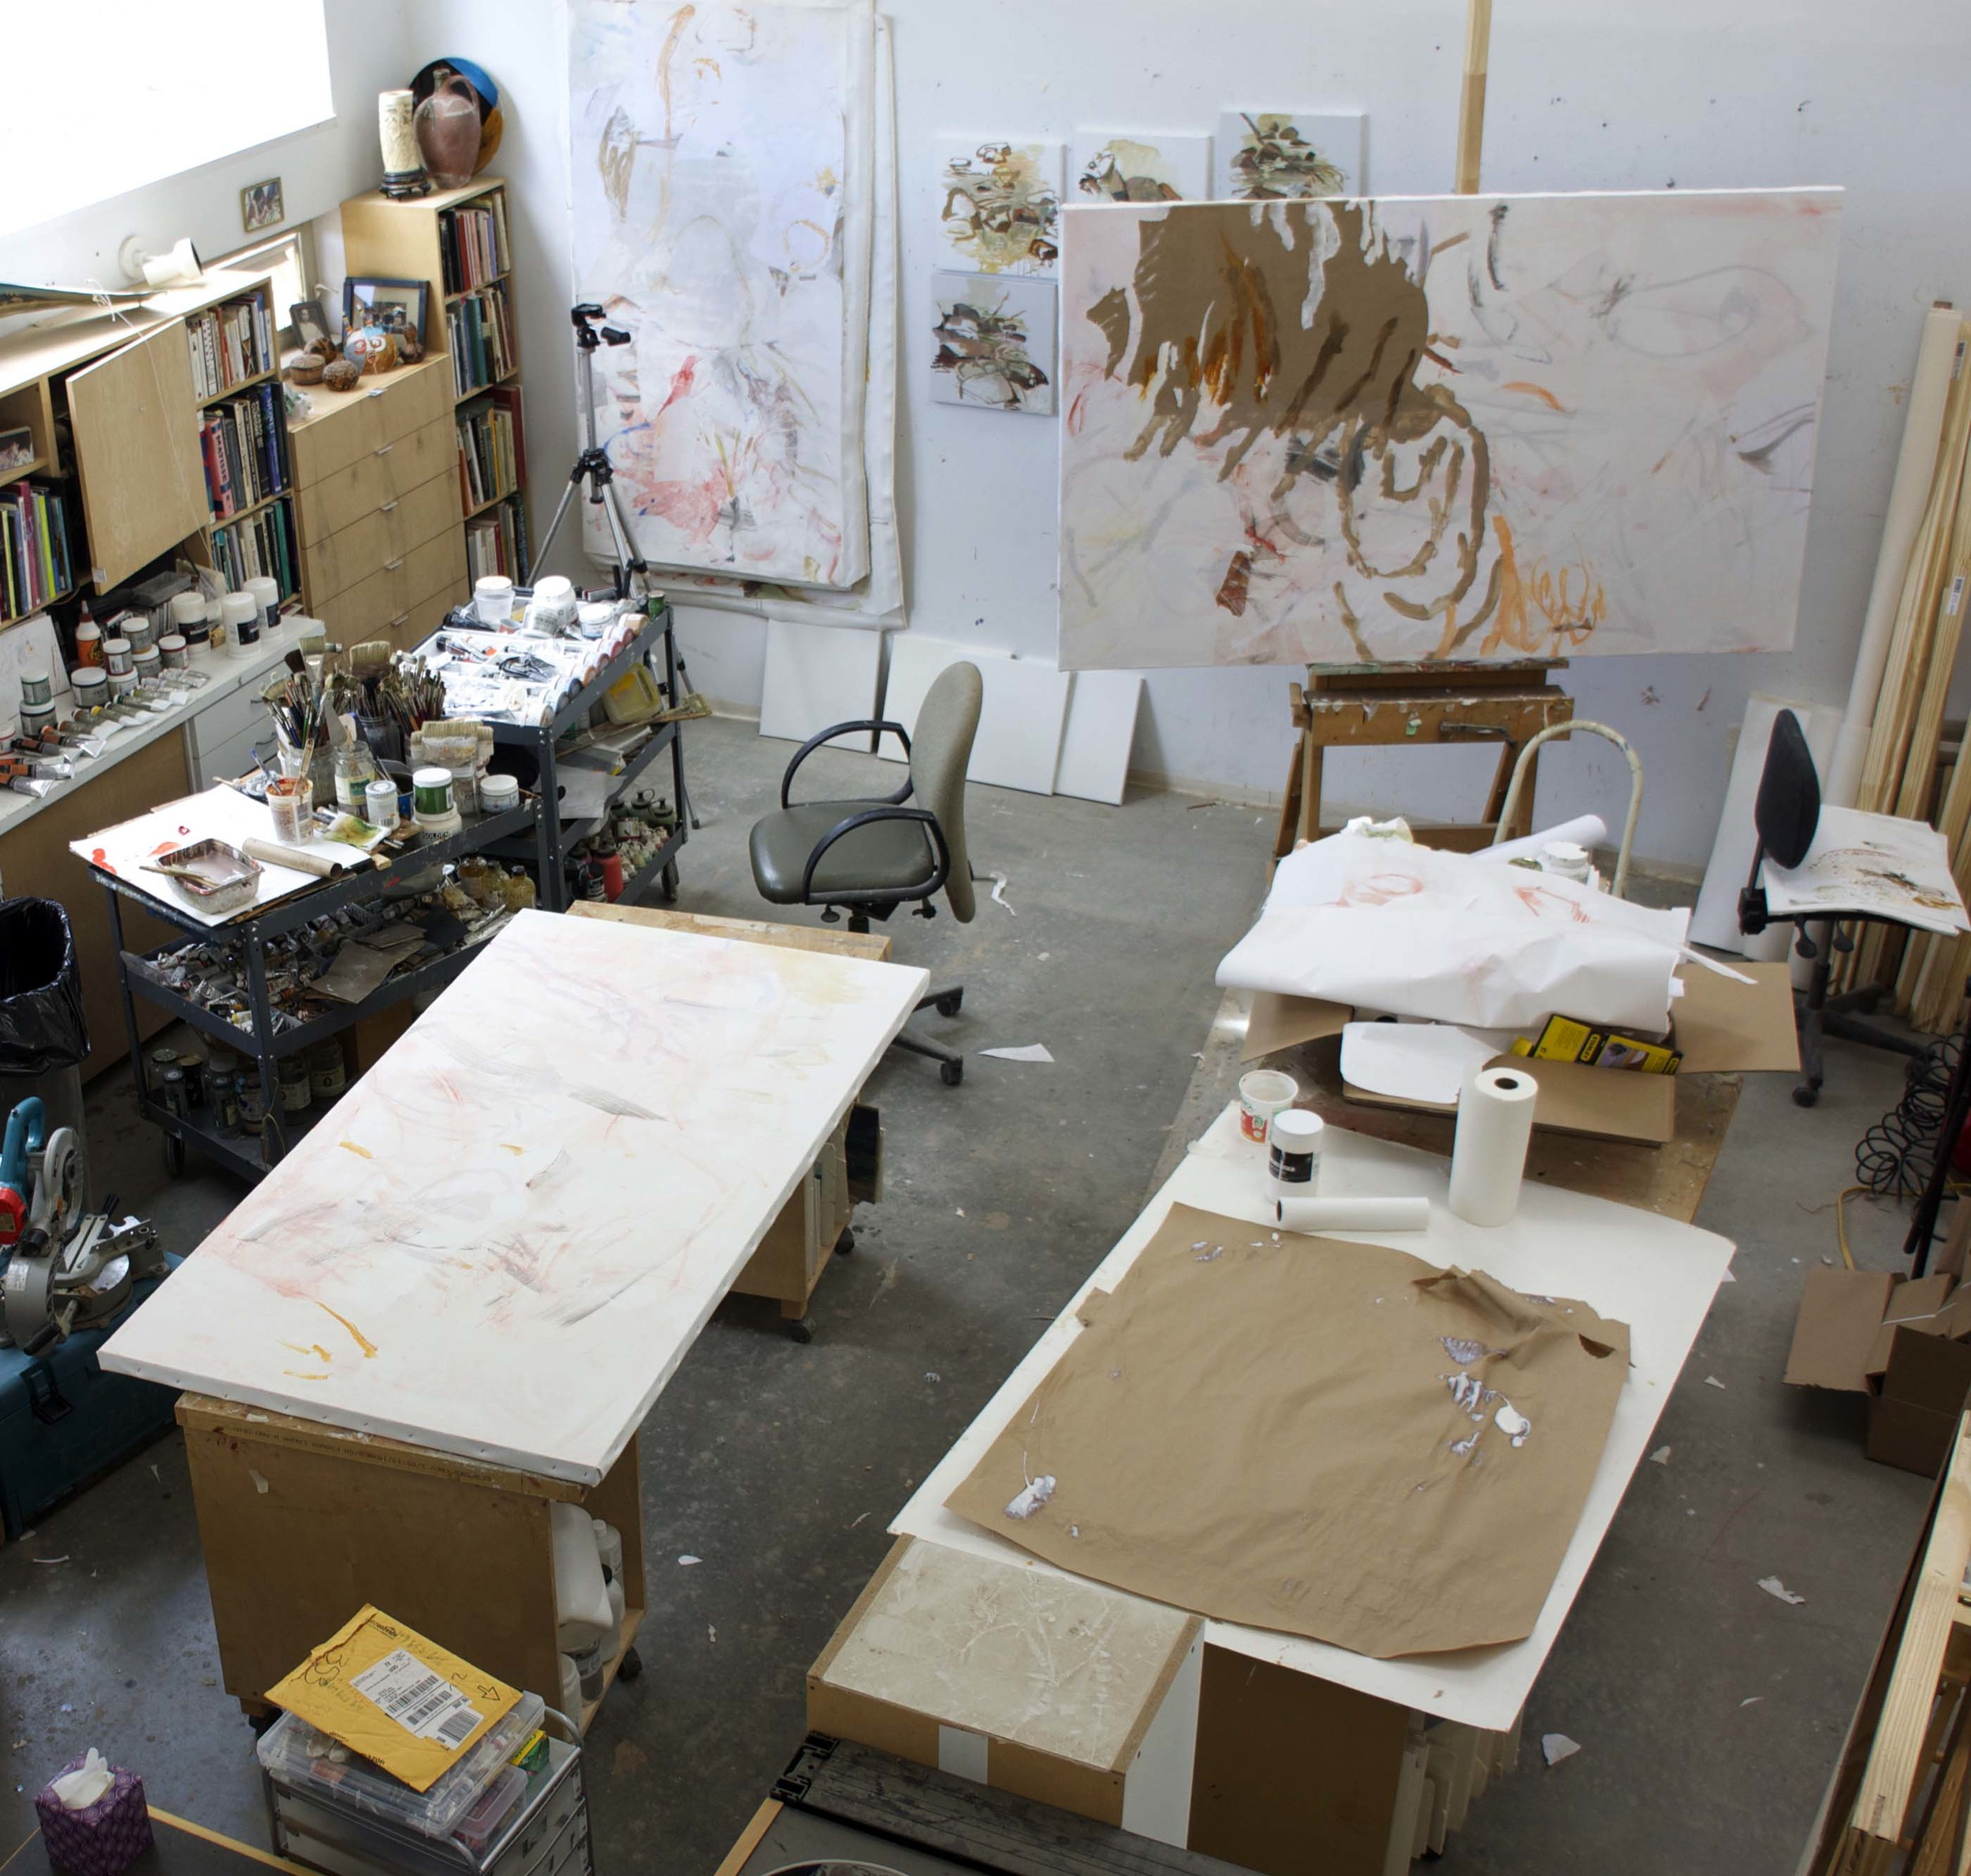 site-6.12.13 RAW Liang Creek-studio shot 1  72x38.jpg